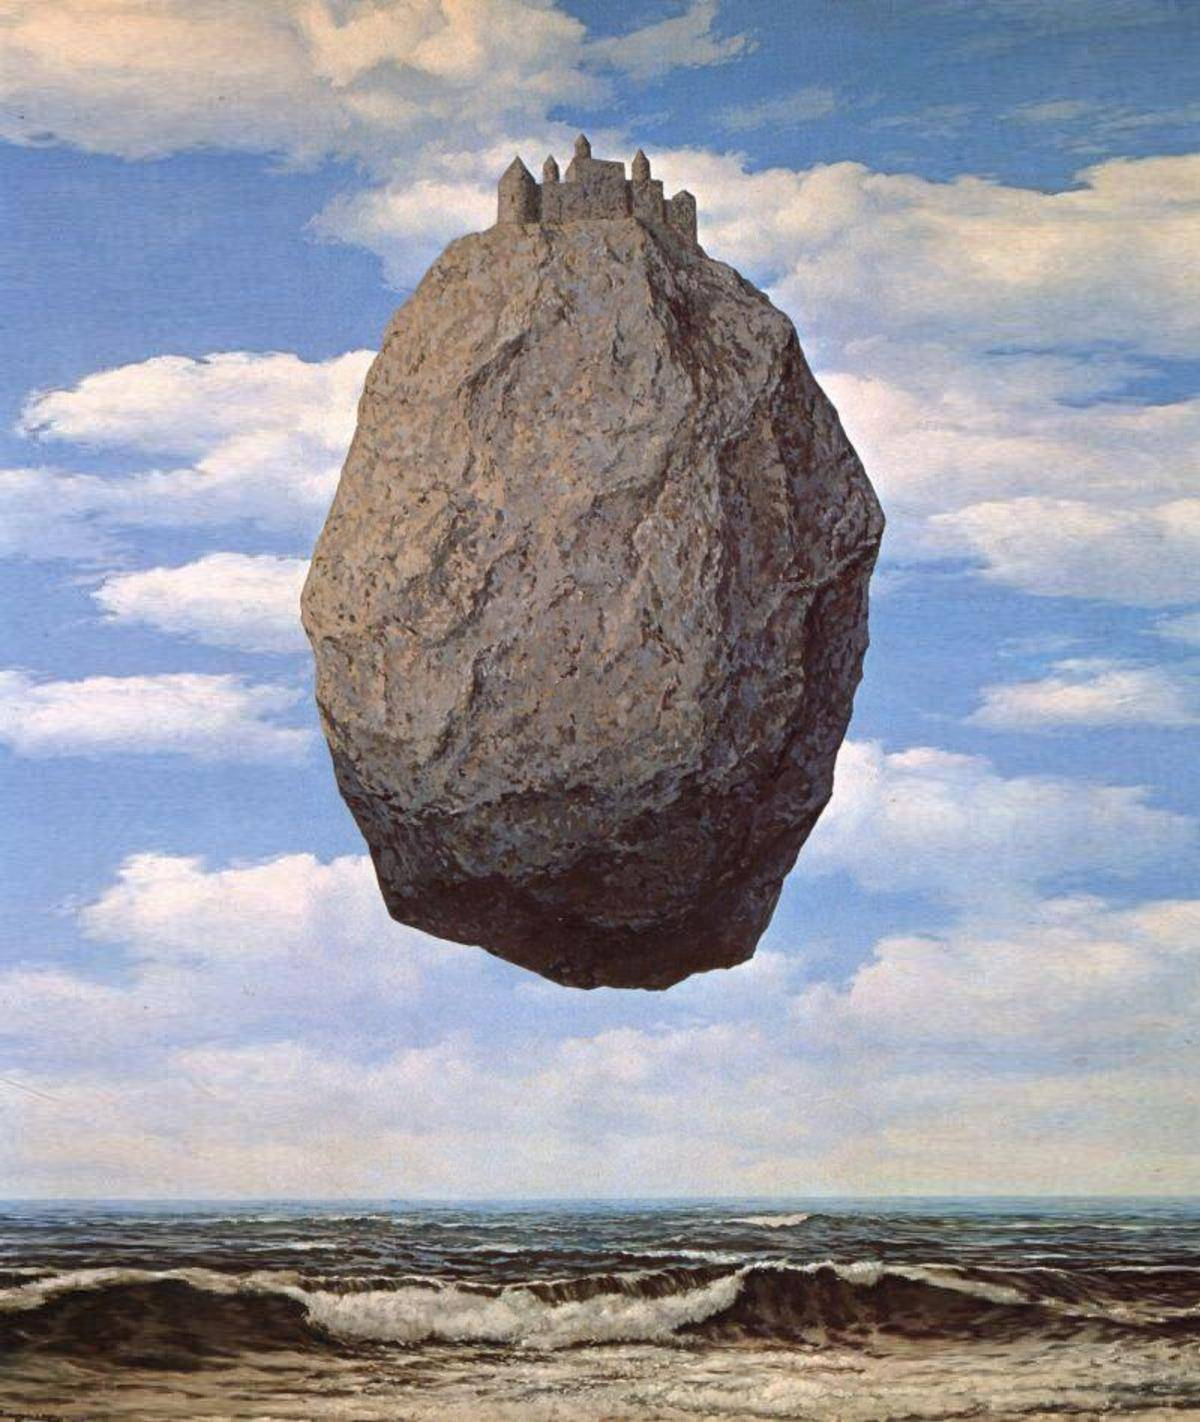 Rene Magritte 12001422 Wallpaper 618891 1200x1422